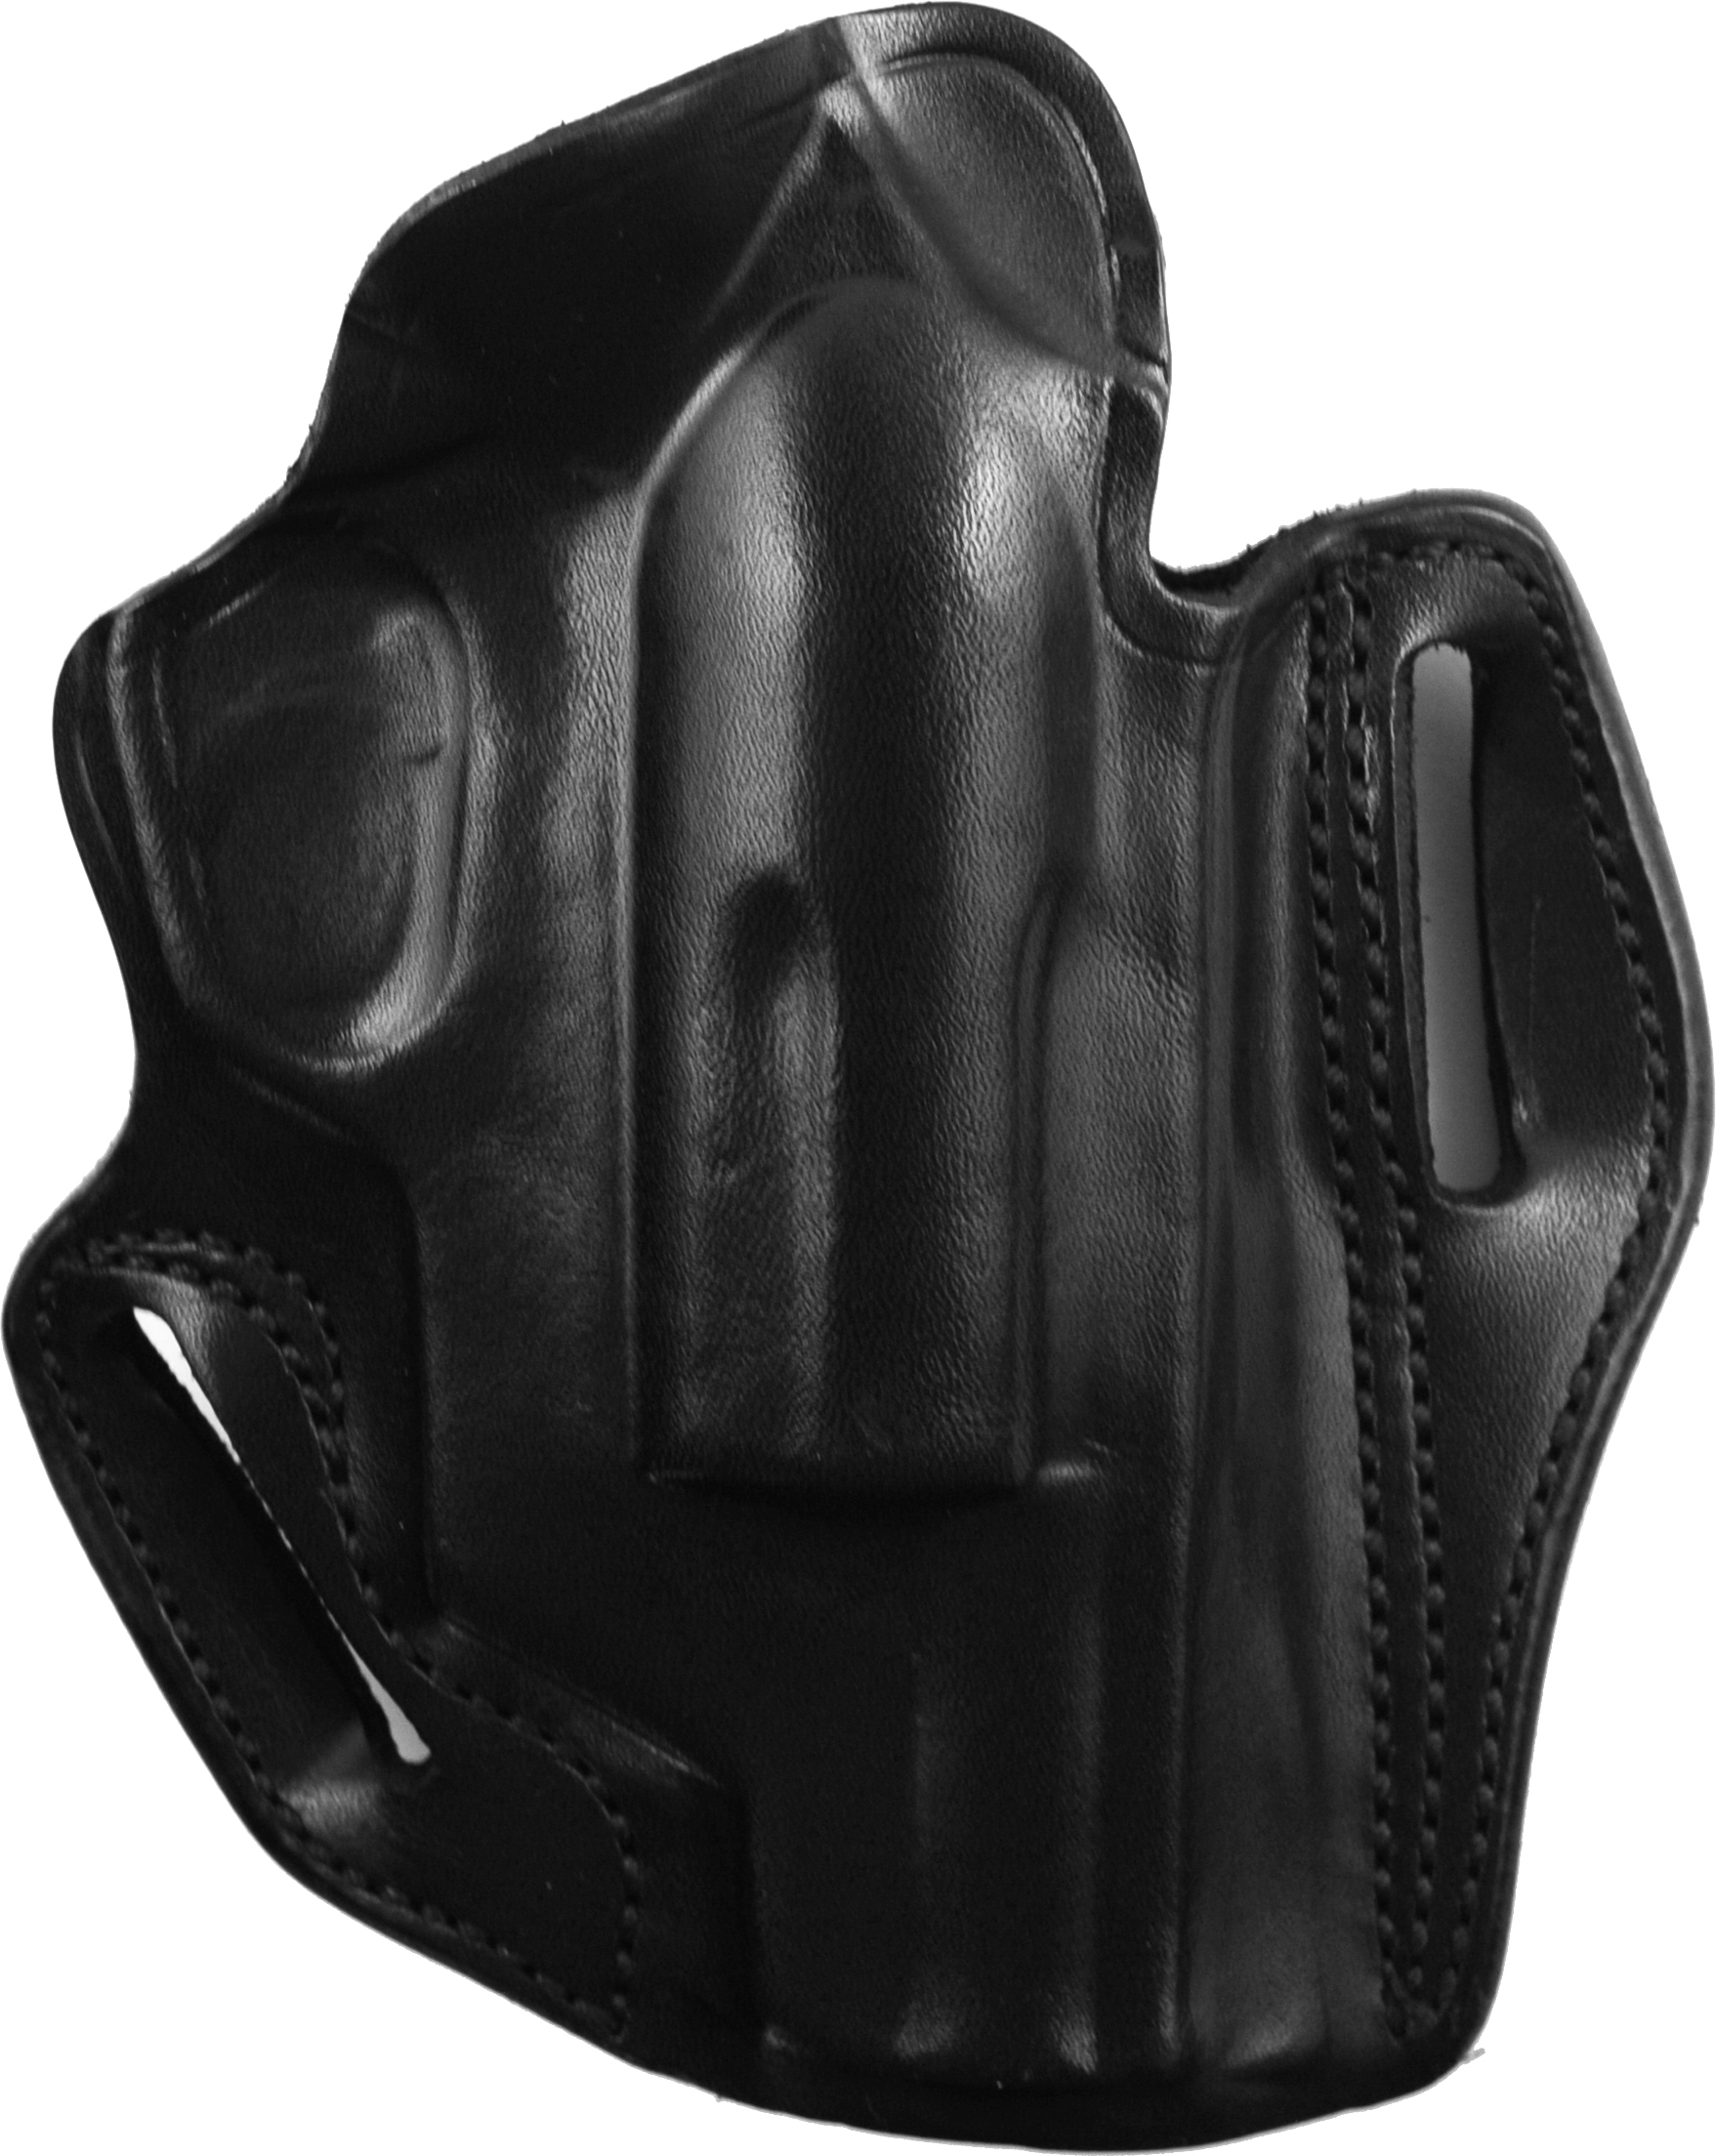 DeSantis Speed Scabbard Holster for Taurus Judge Public Defender Polymer  Frame